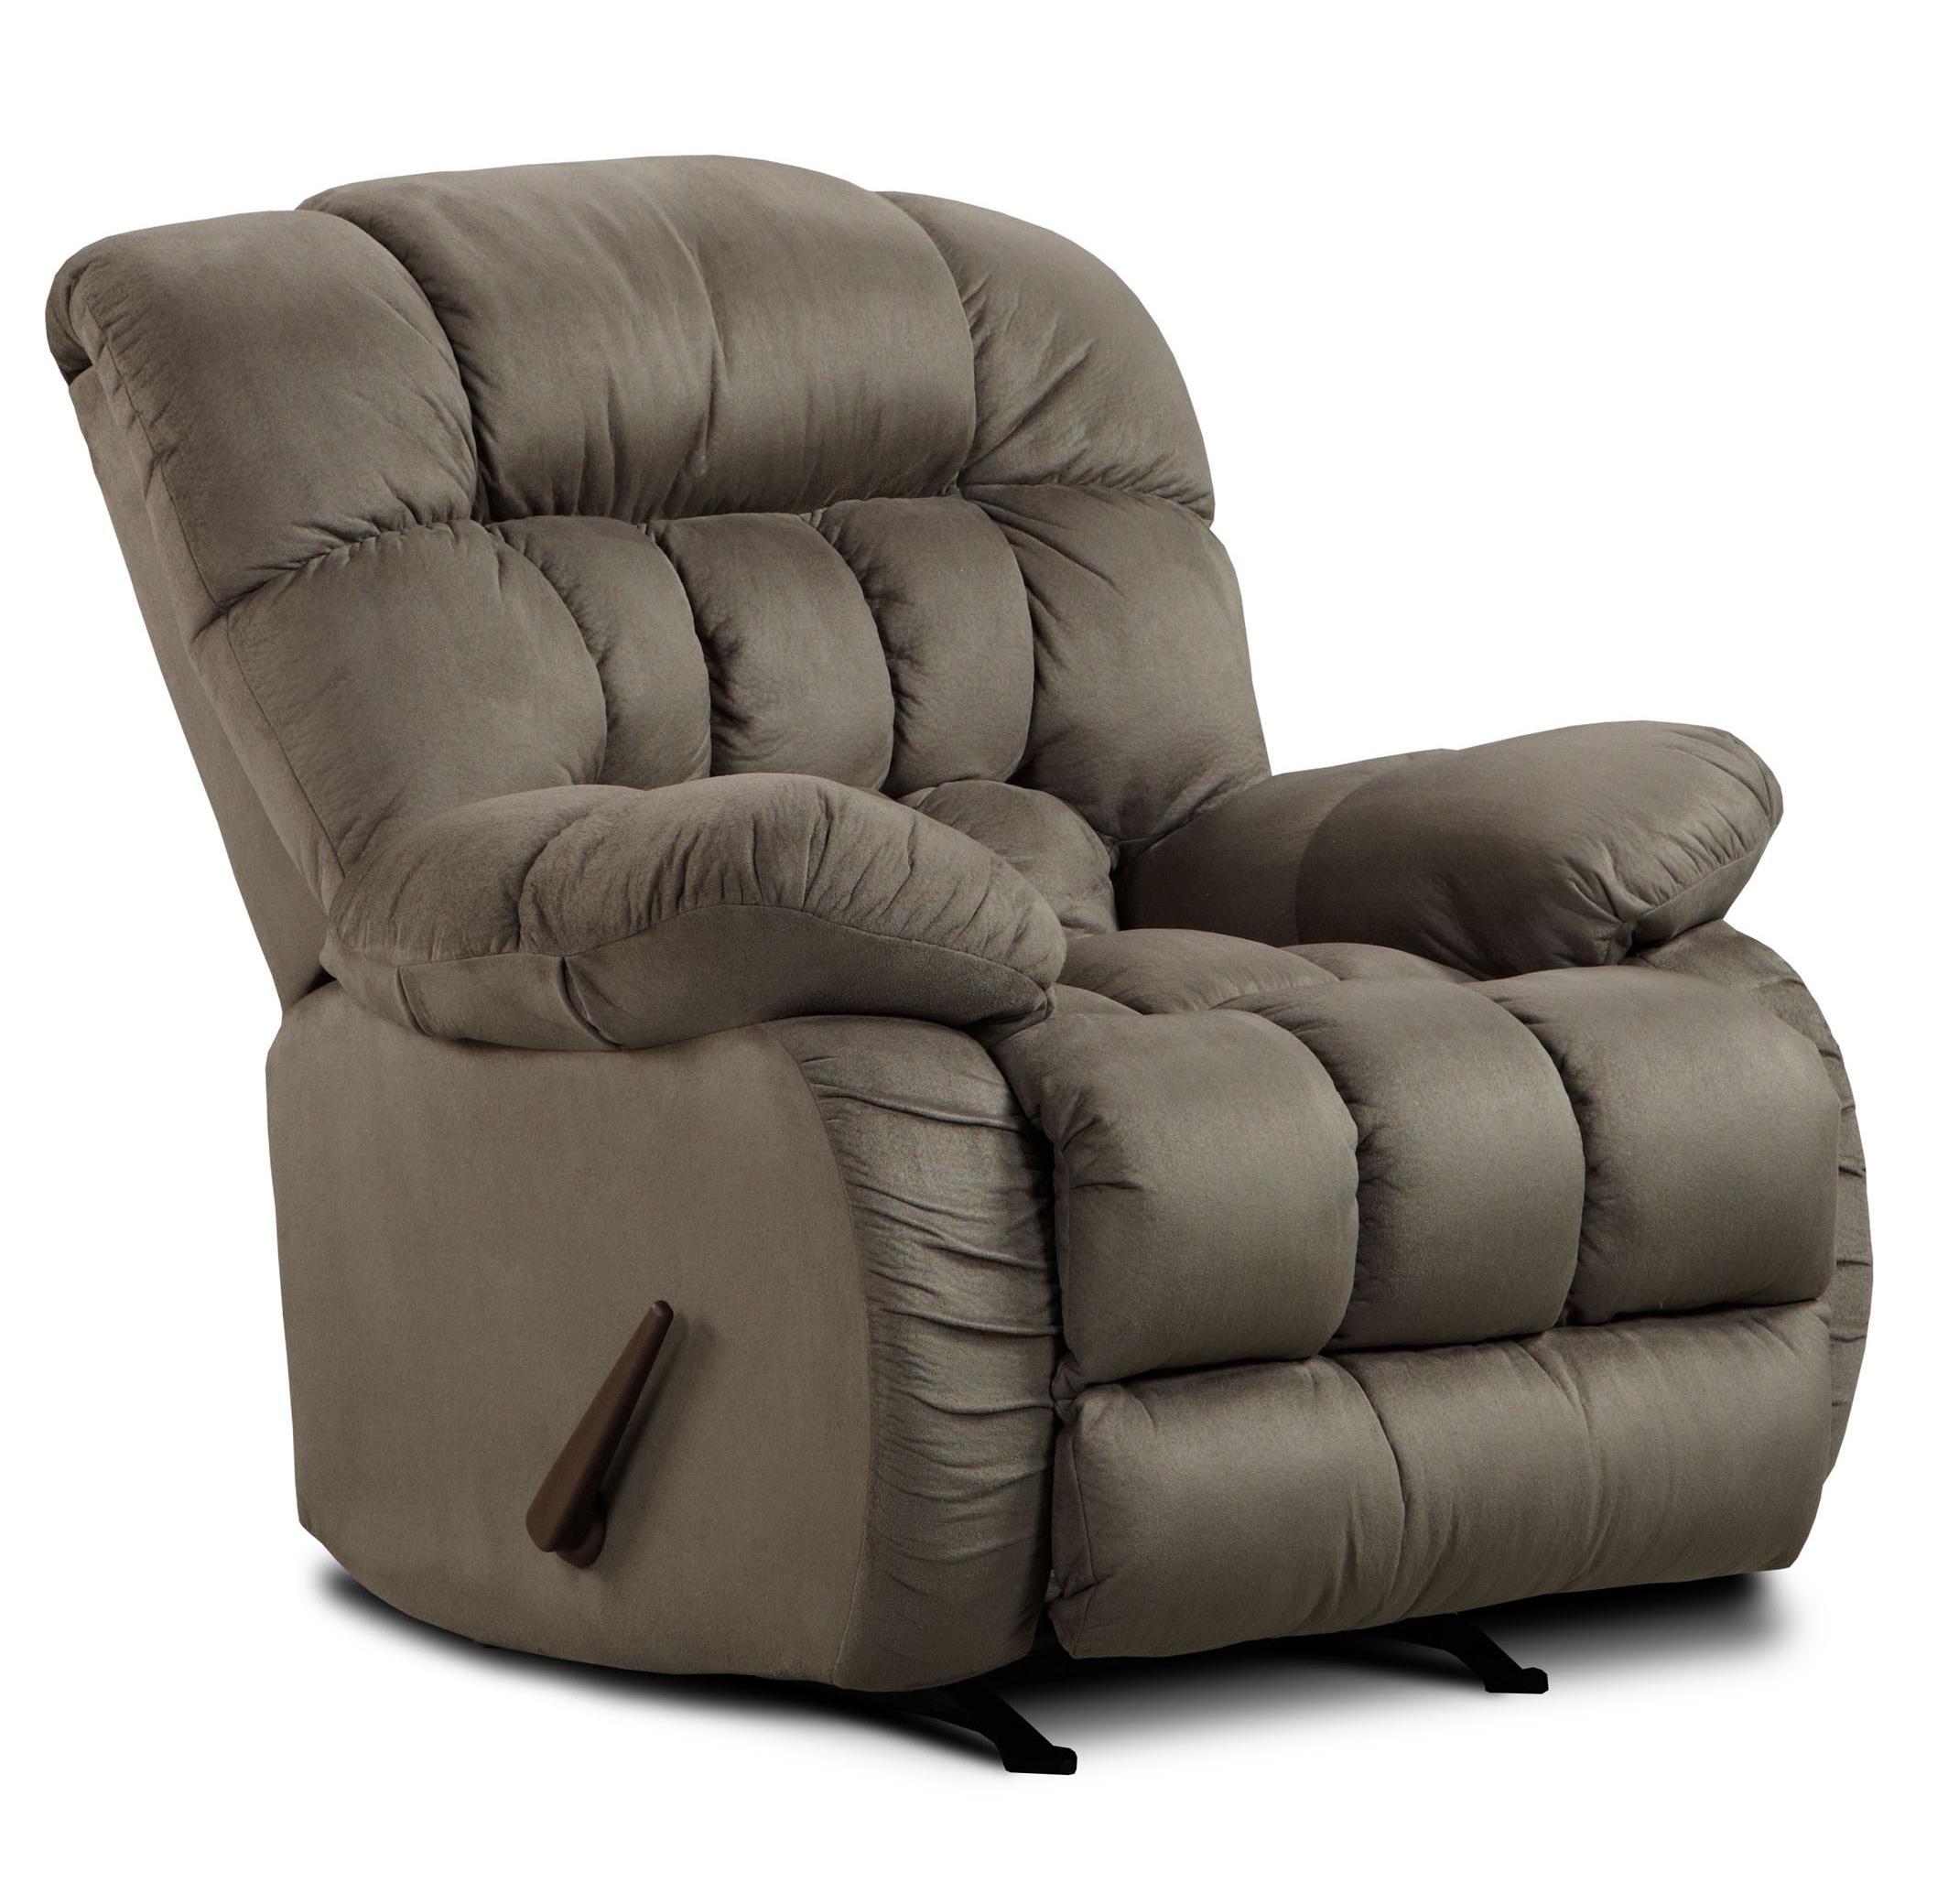 9200 Casual Recliner by Washington Furniture at Lynn's Furniture & Mattress